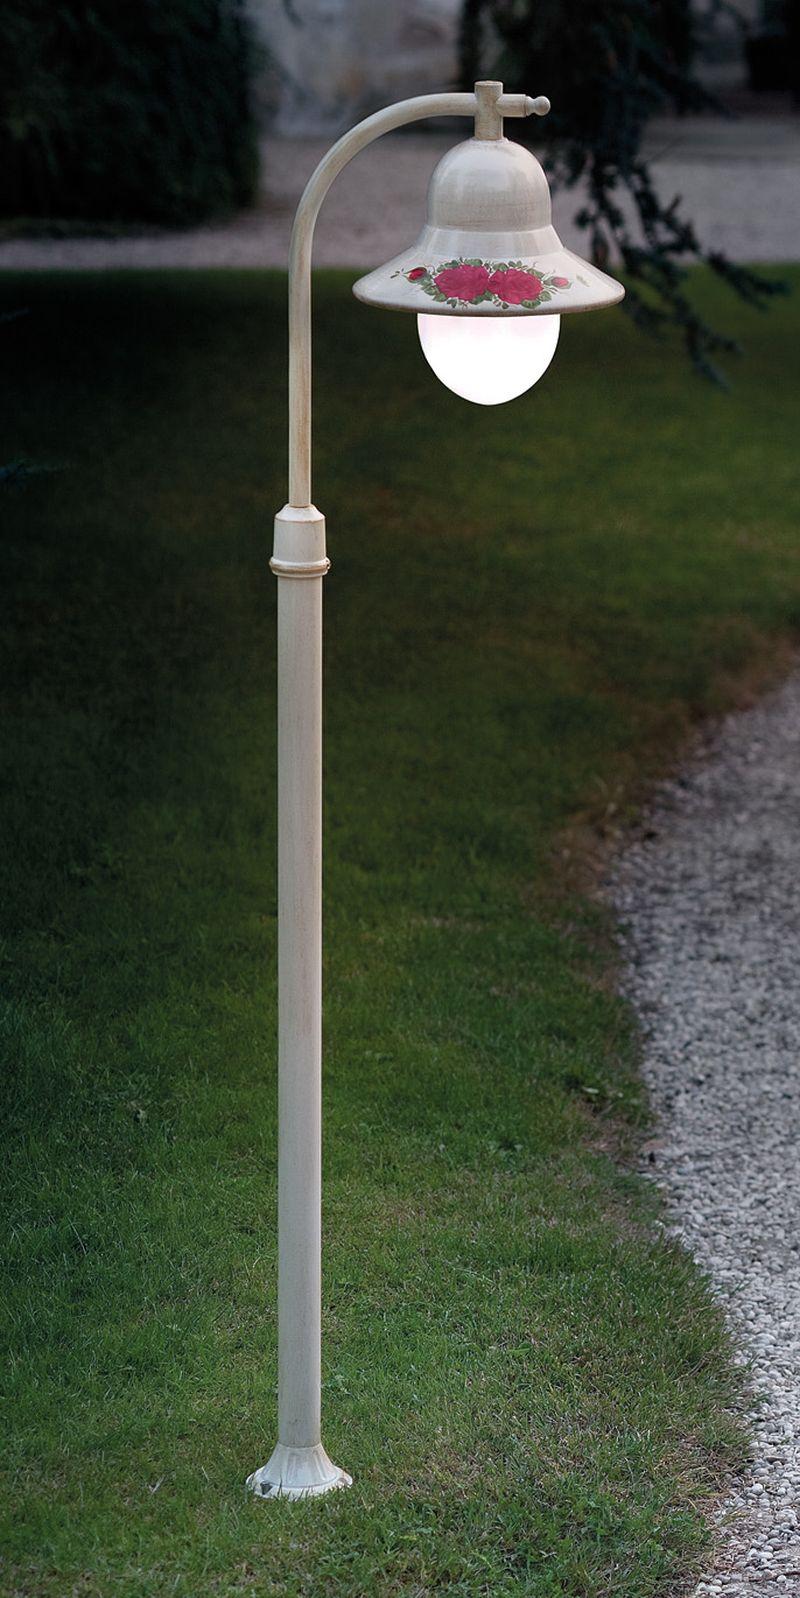 Lampadario artigianale sospensione in ceramica decorato a mano diametro 31cm. Ferroluce Italian Ceramic Chandelier And Lamps Luxury Table Lamps Online Shop